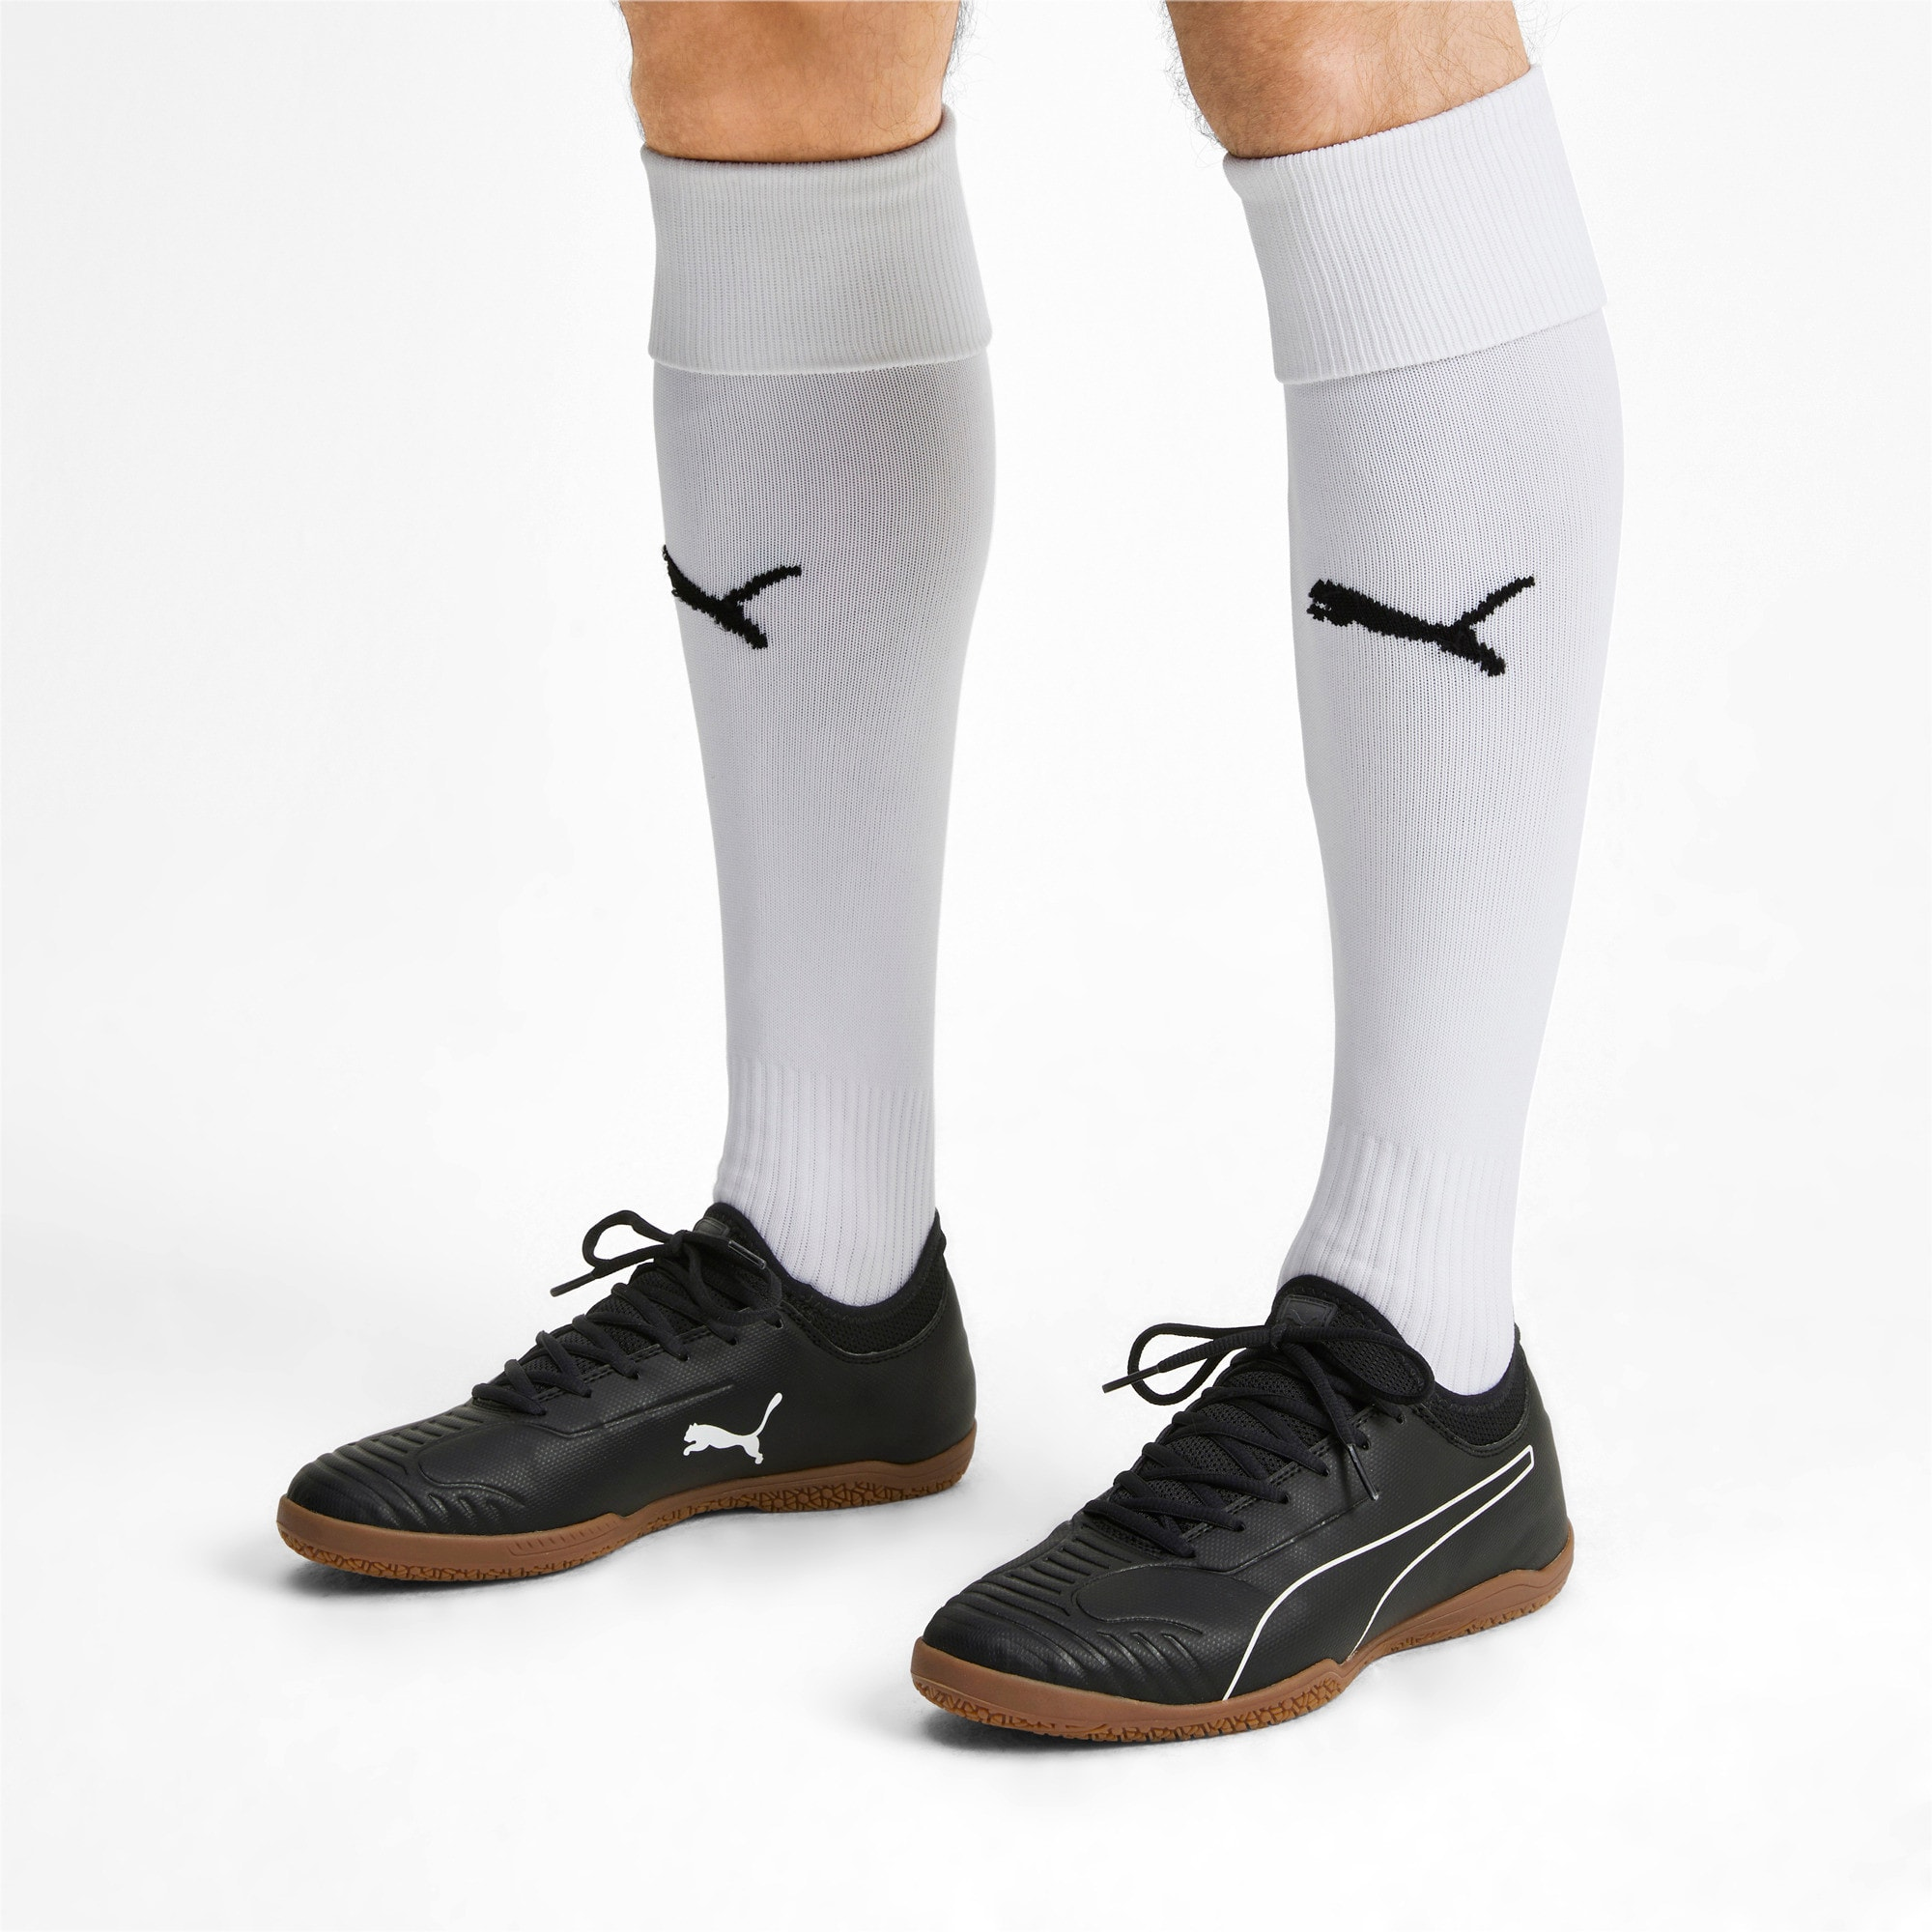 Thumbnail 2 of 365 Sala 2 Men's Football Boots, Puma Black-Puma White-Gum, medium